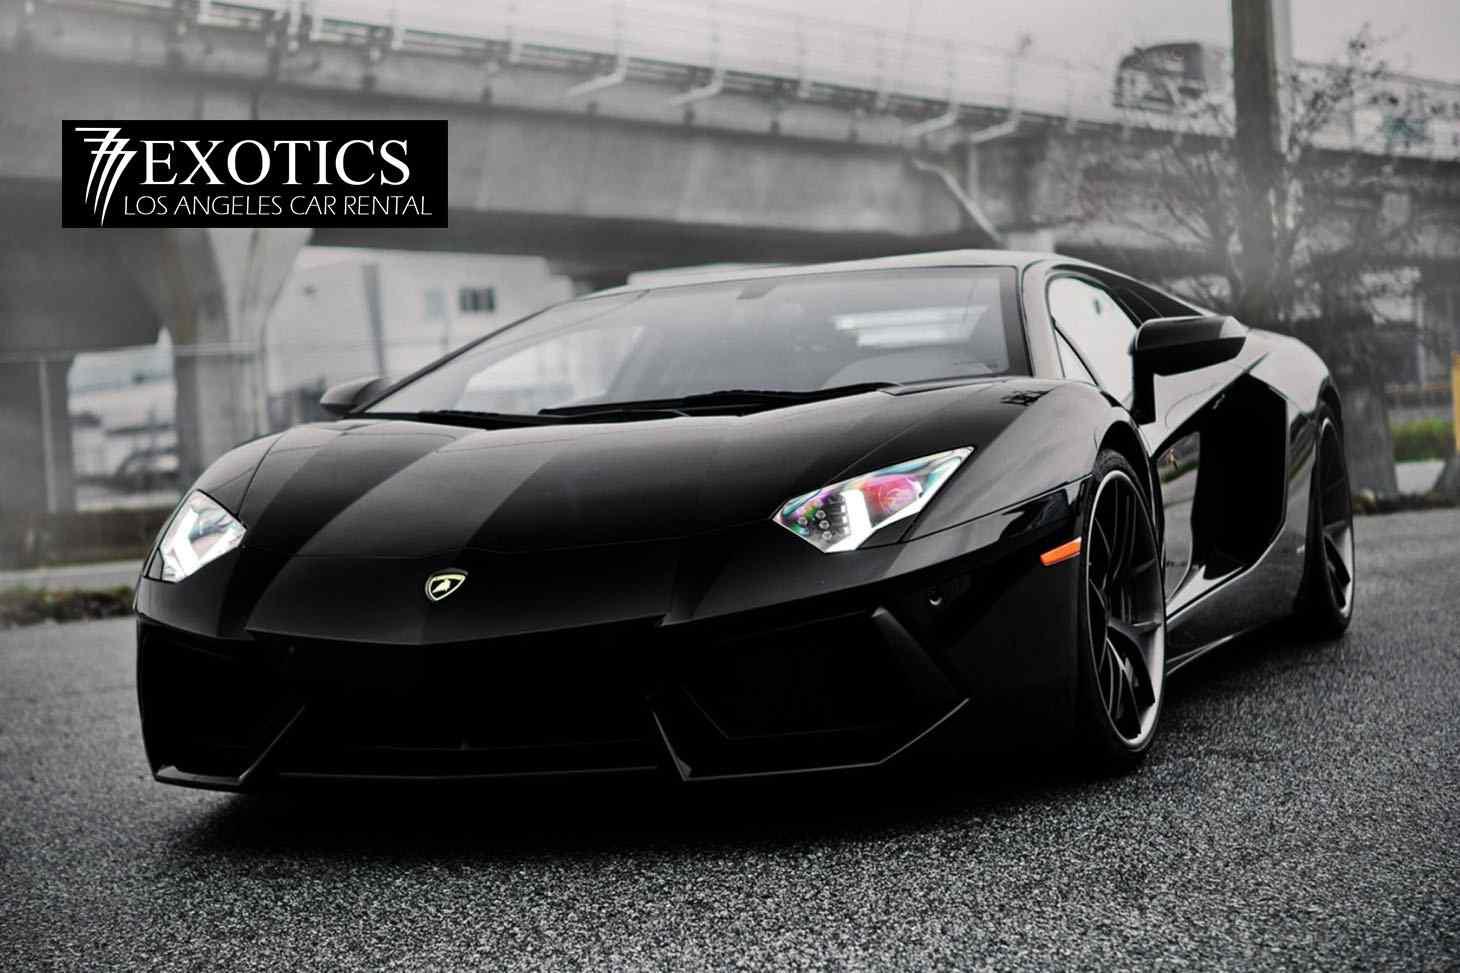 Lamborghini Aventador Rentals Los Angeles And Las Vegas